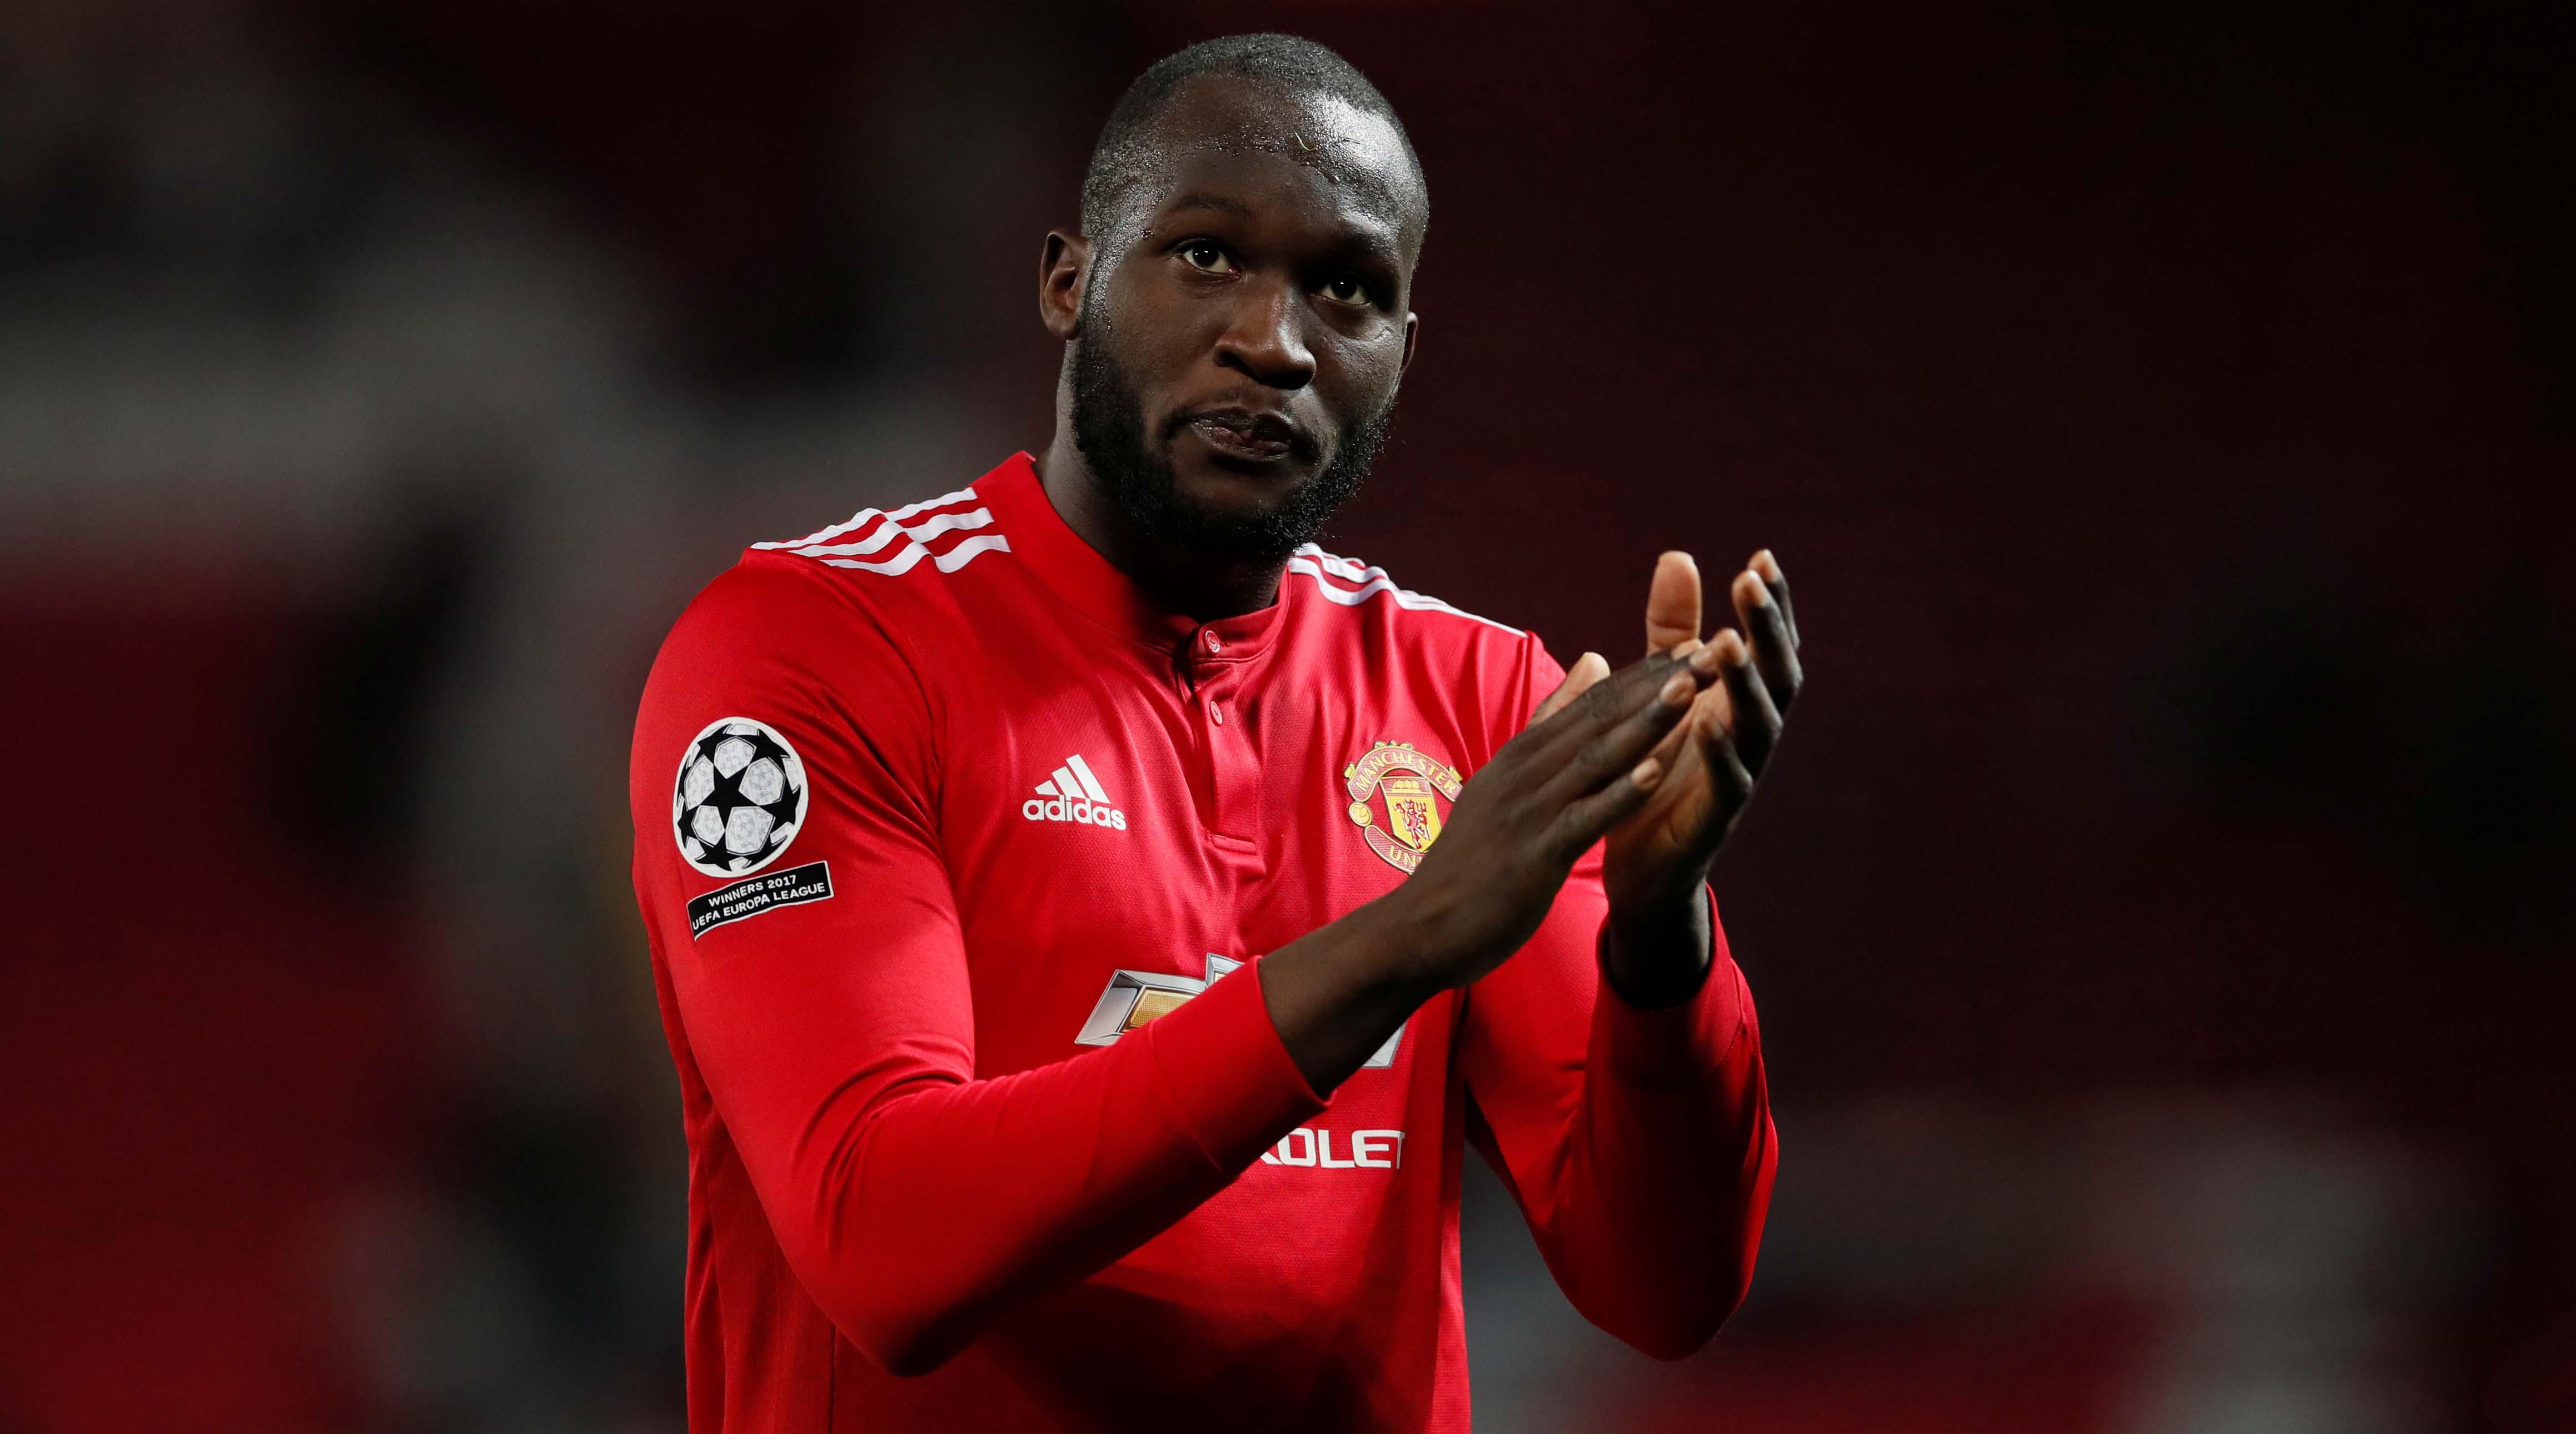 Premier League: Manchester United striker Romelu Lukaku out of Brighton clash, says Jose Mourinho